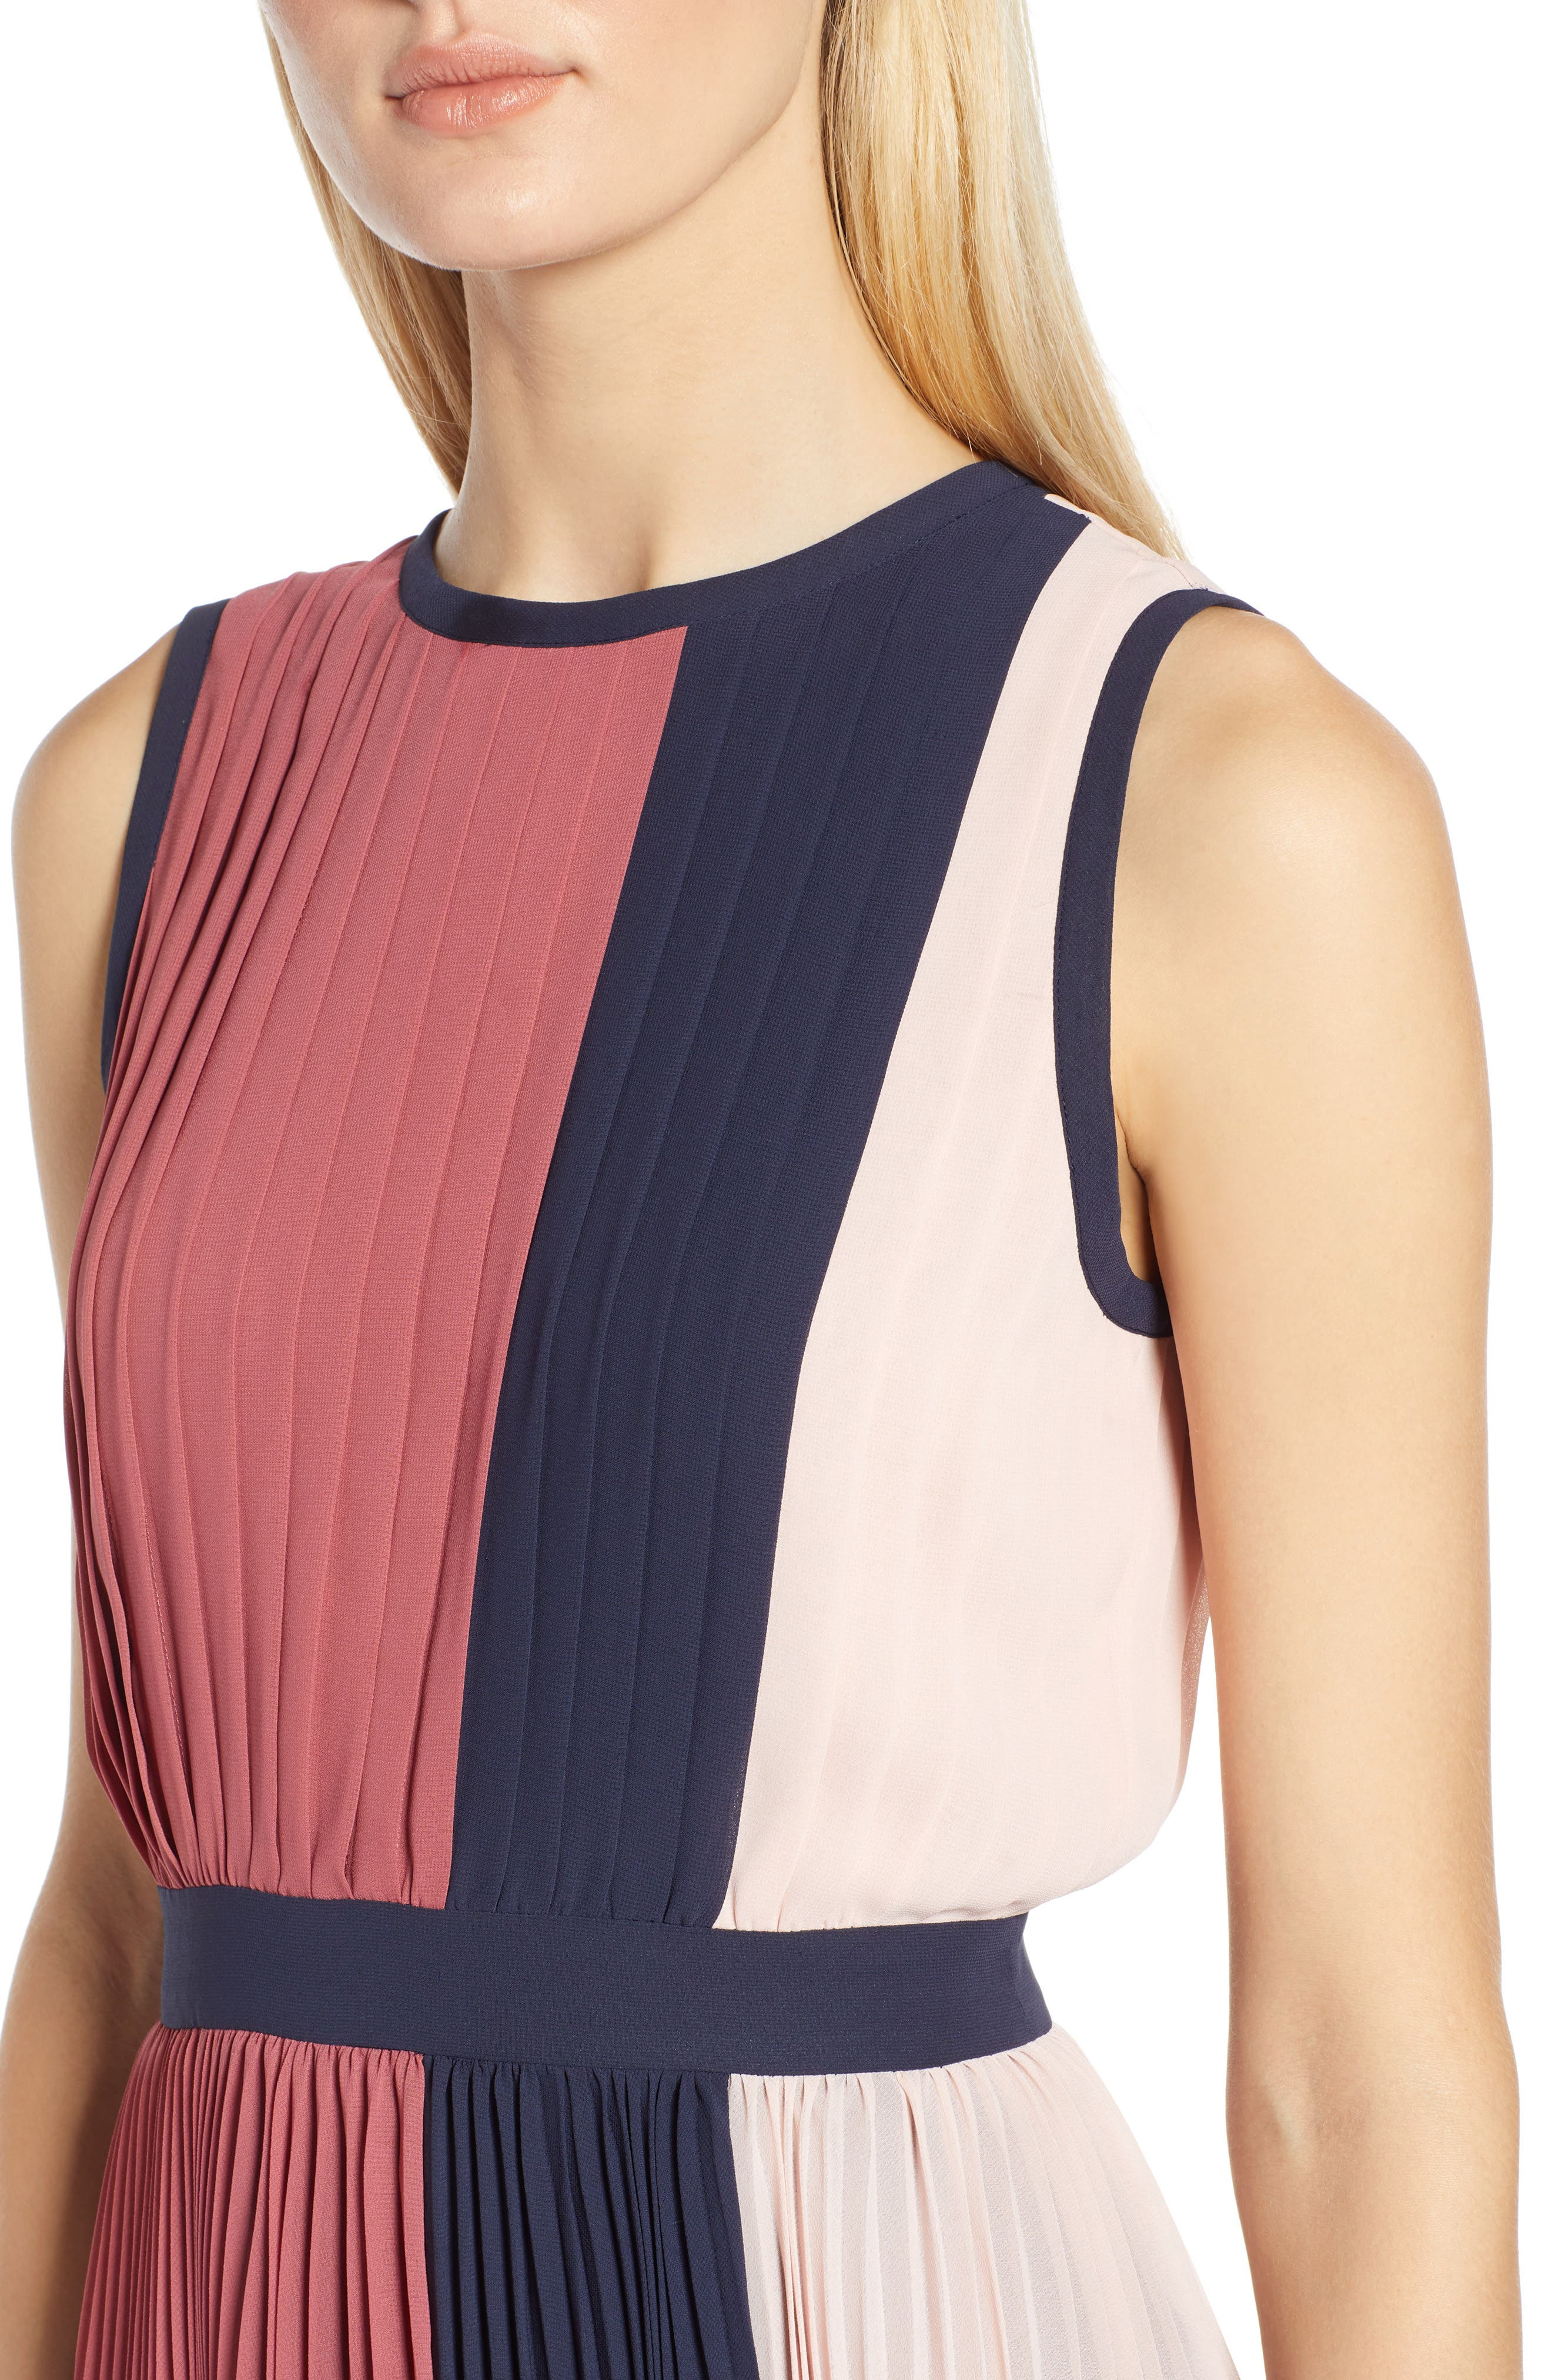 x Atlantic-Pacific Colorblock Pleated Midi Dress,                             Alternate thumbnail 4, color,                             PINK- NAVY COLORBLOCK